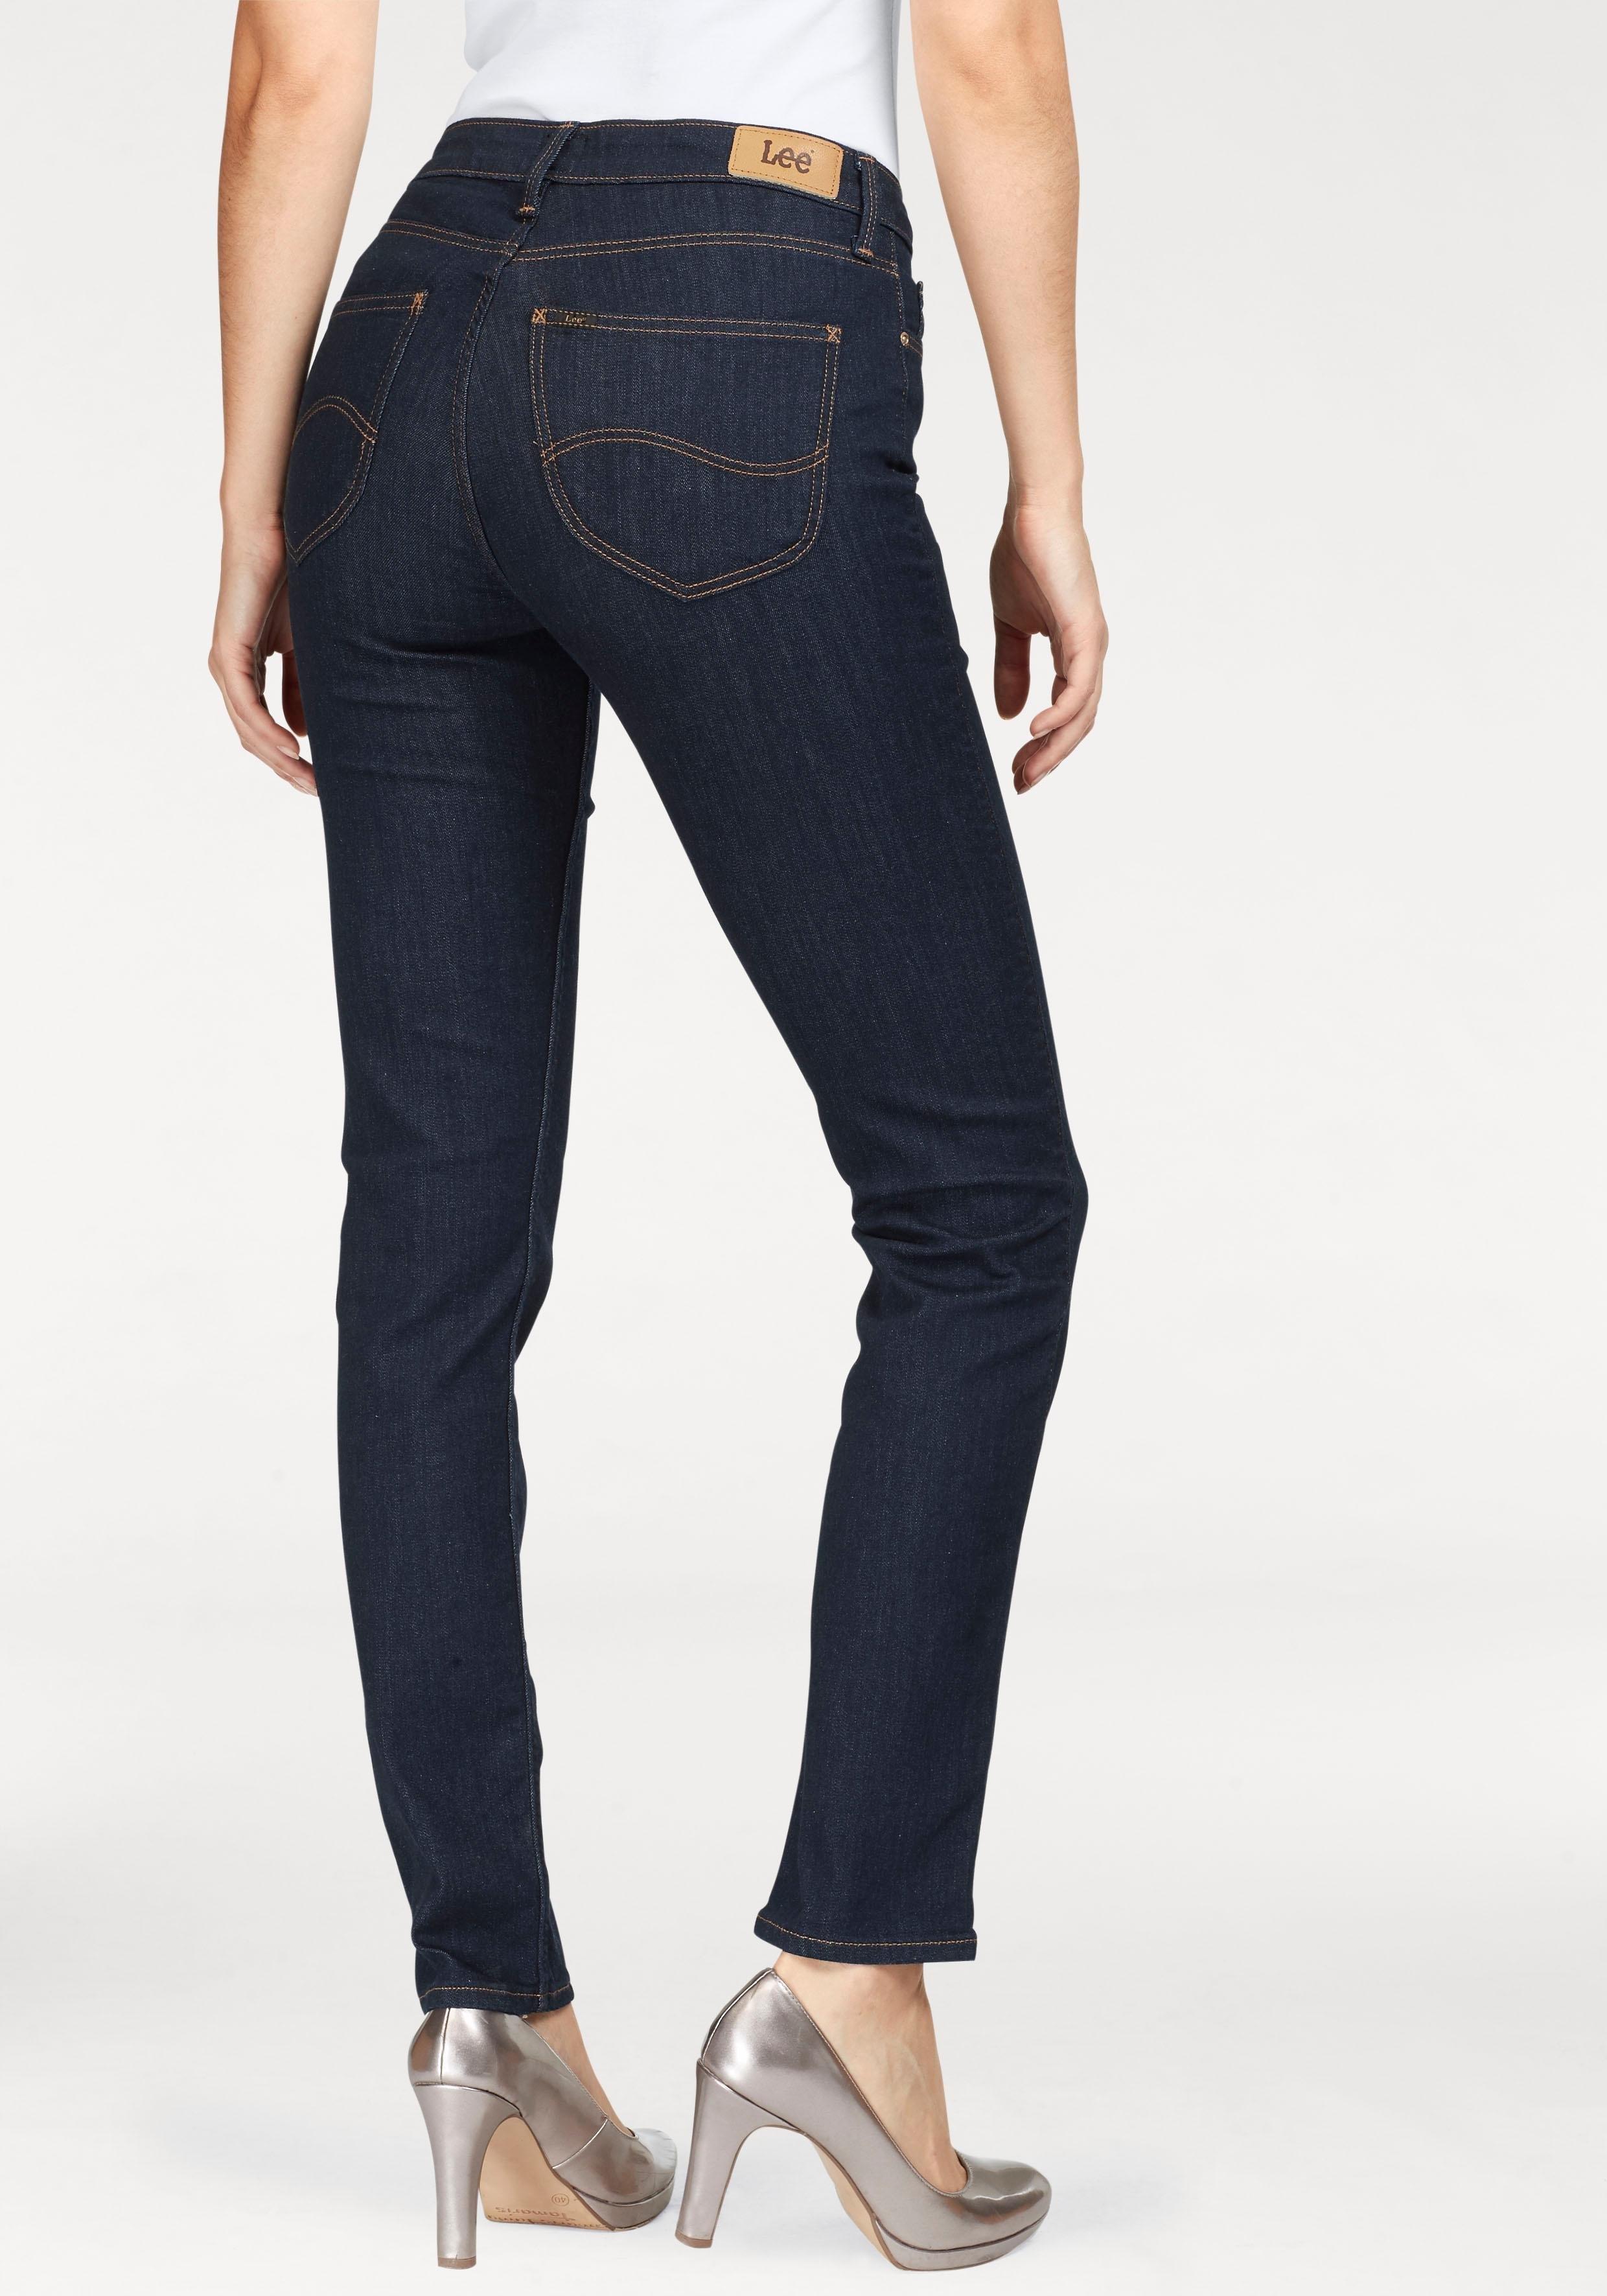 Lee Slim Fit-jeans - gratis ruilen op otto.nl